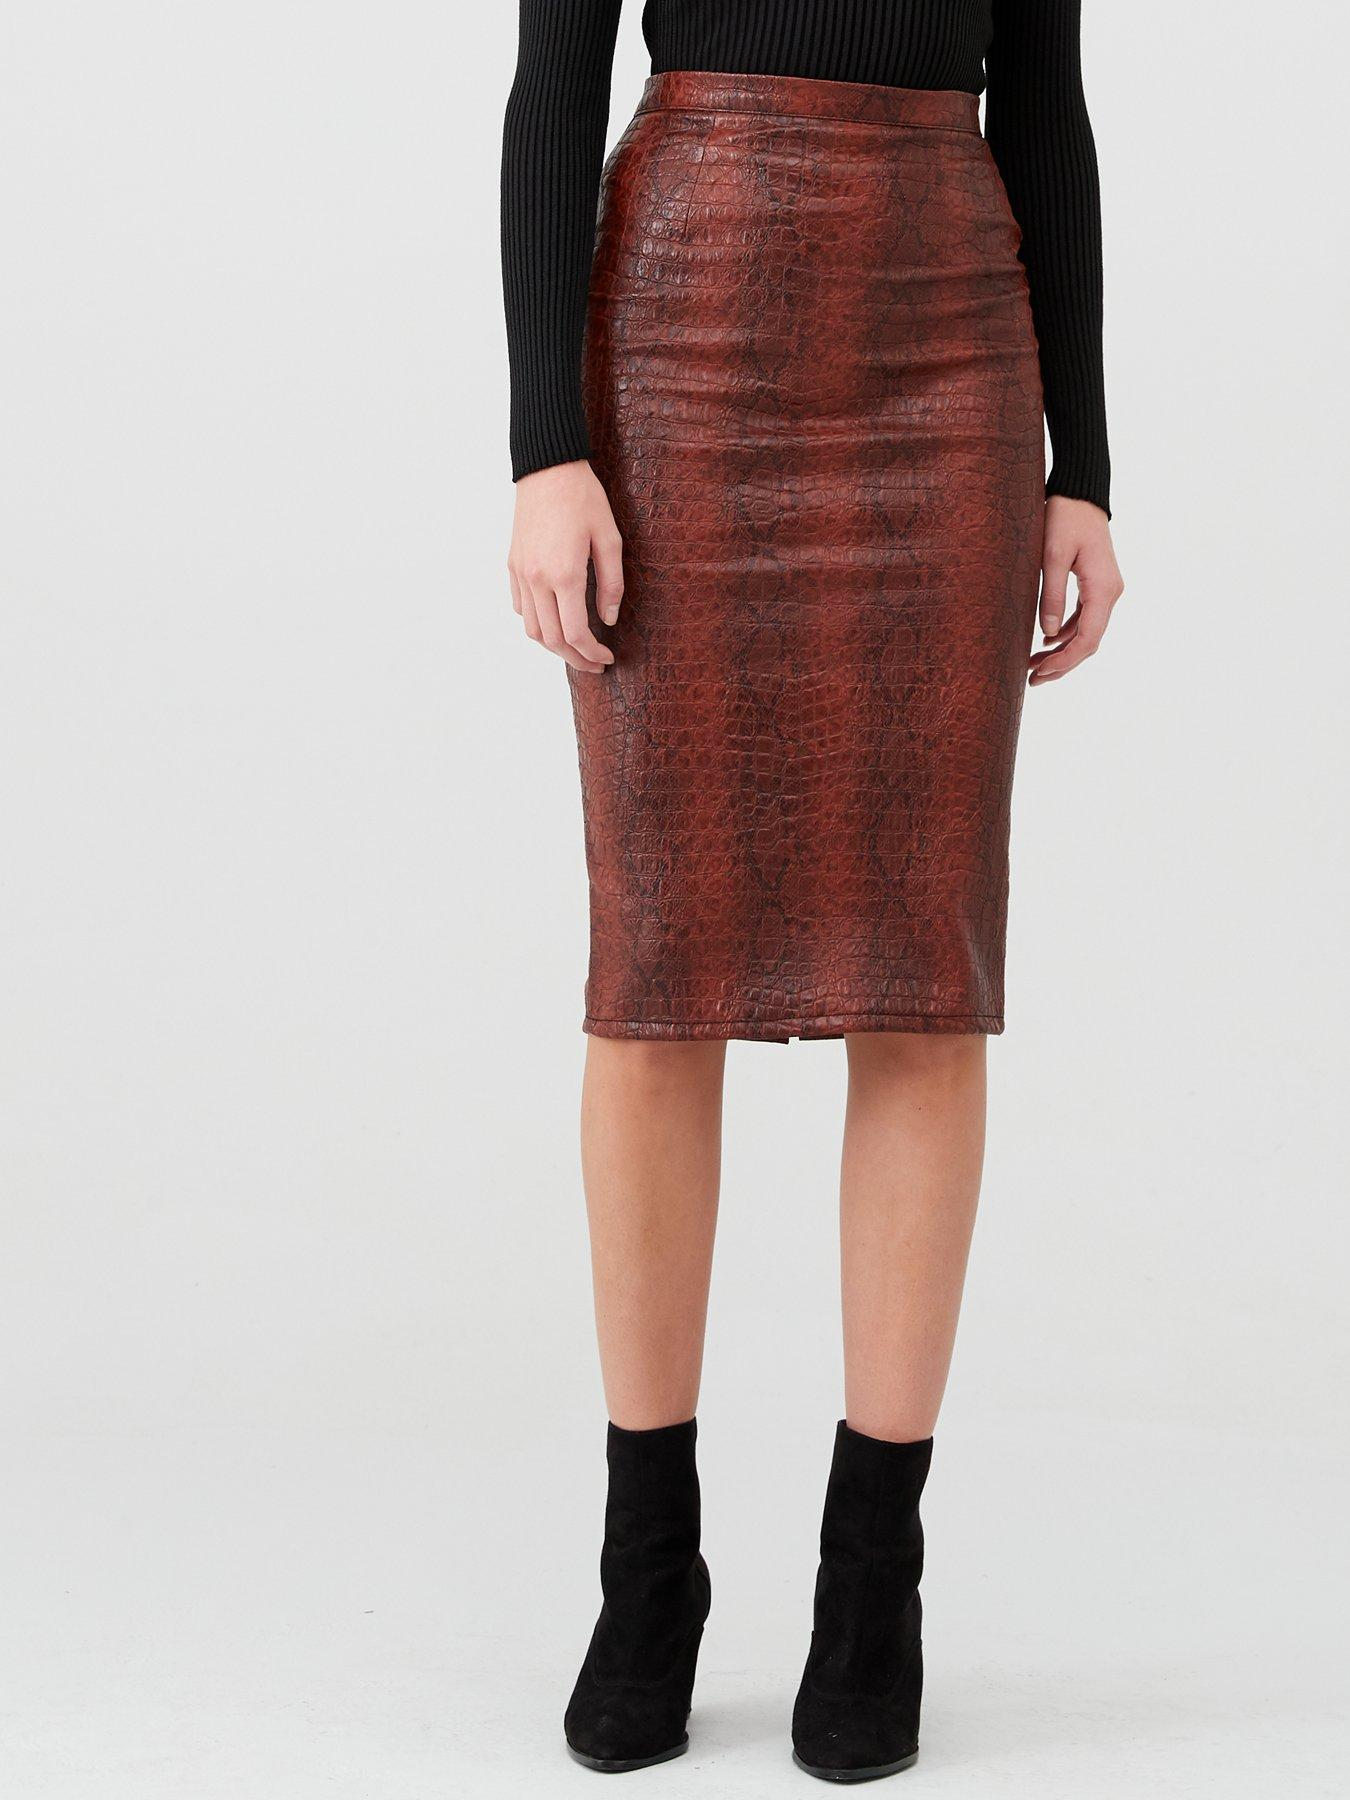 New Ladies Women Pull On Front Slit Pencil Skirt Plus Sizes 12-22